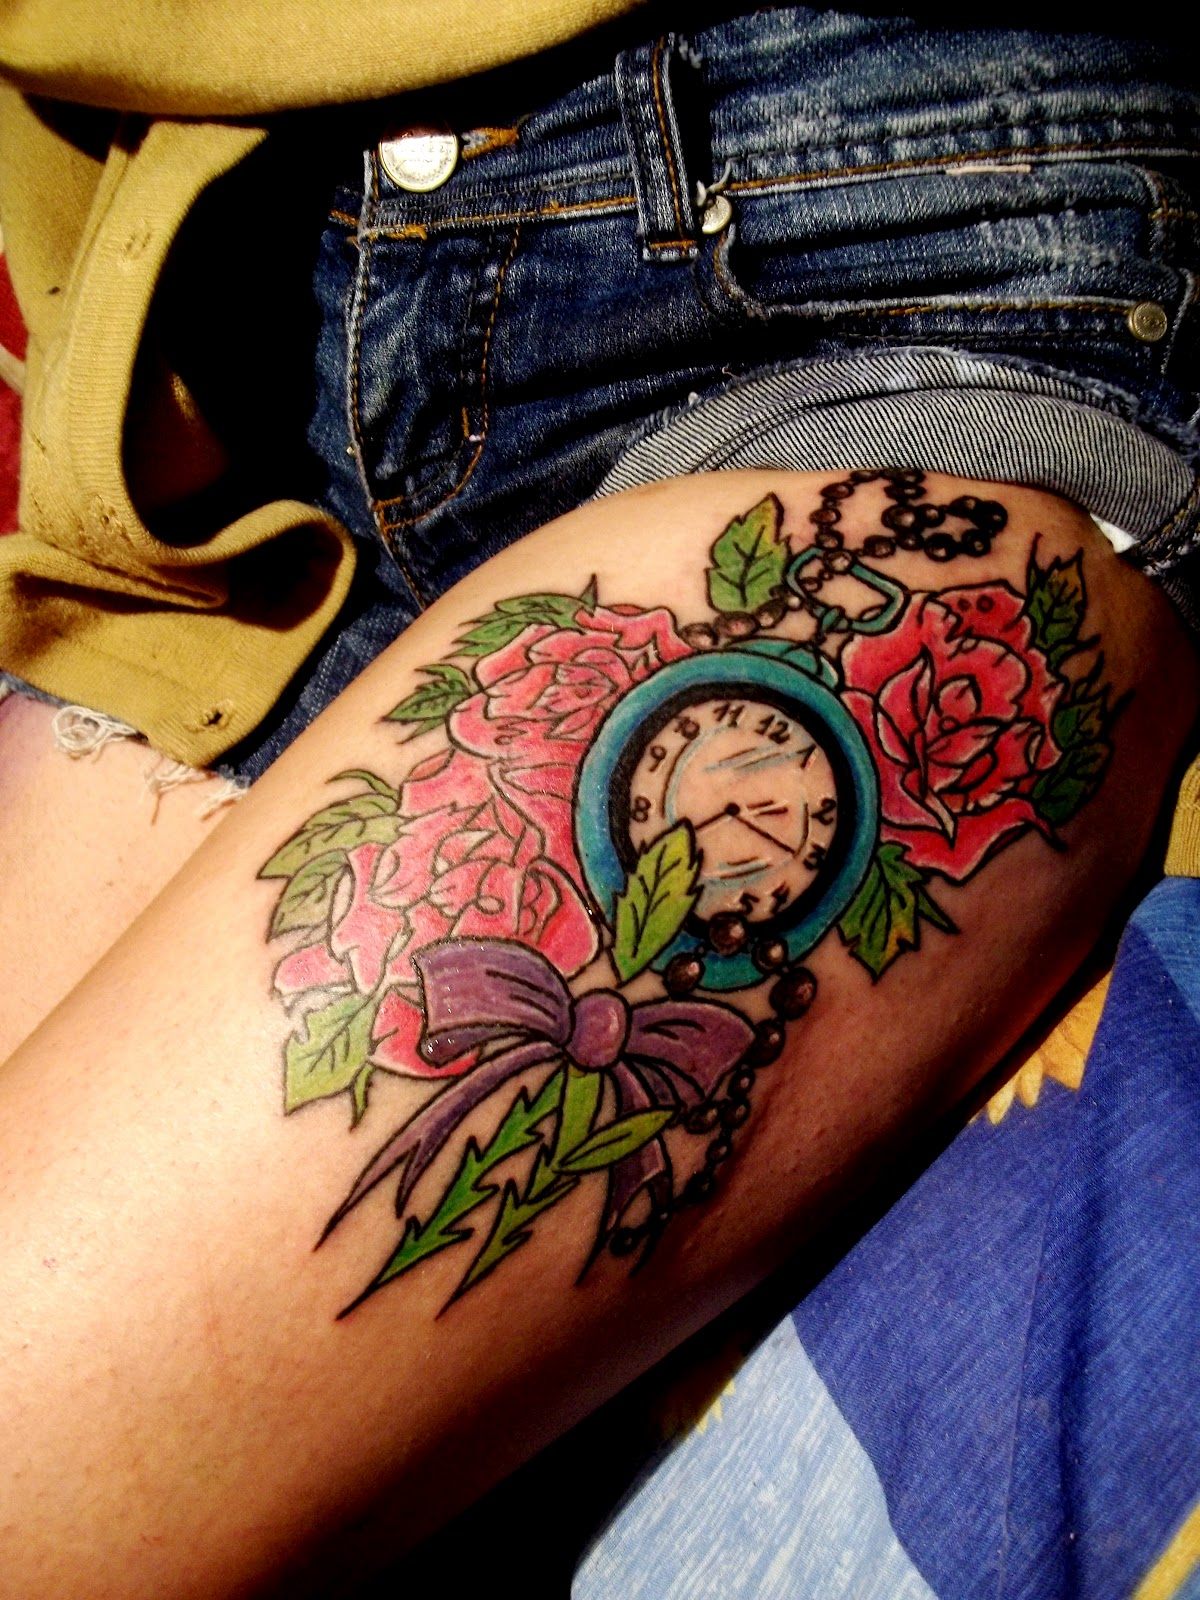 Tatuaje mujer y reloj